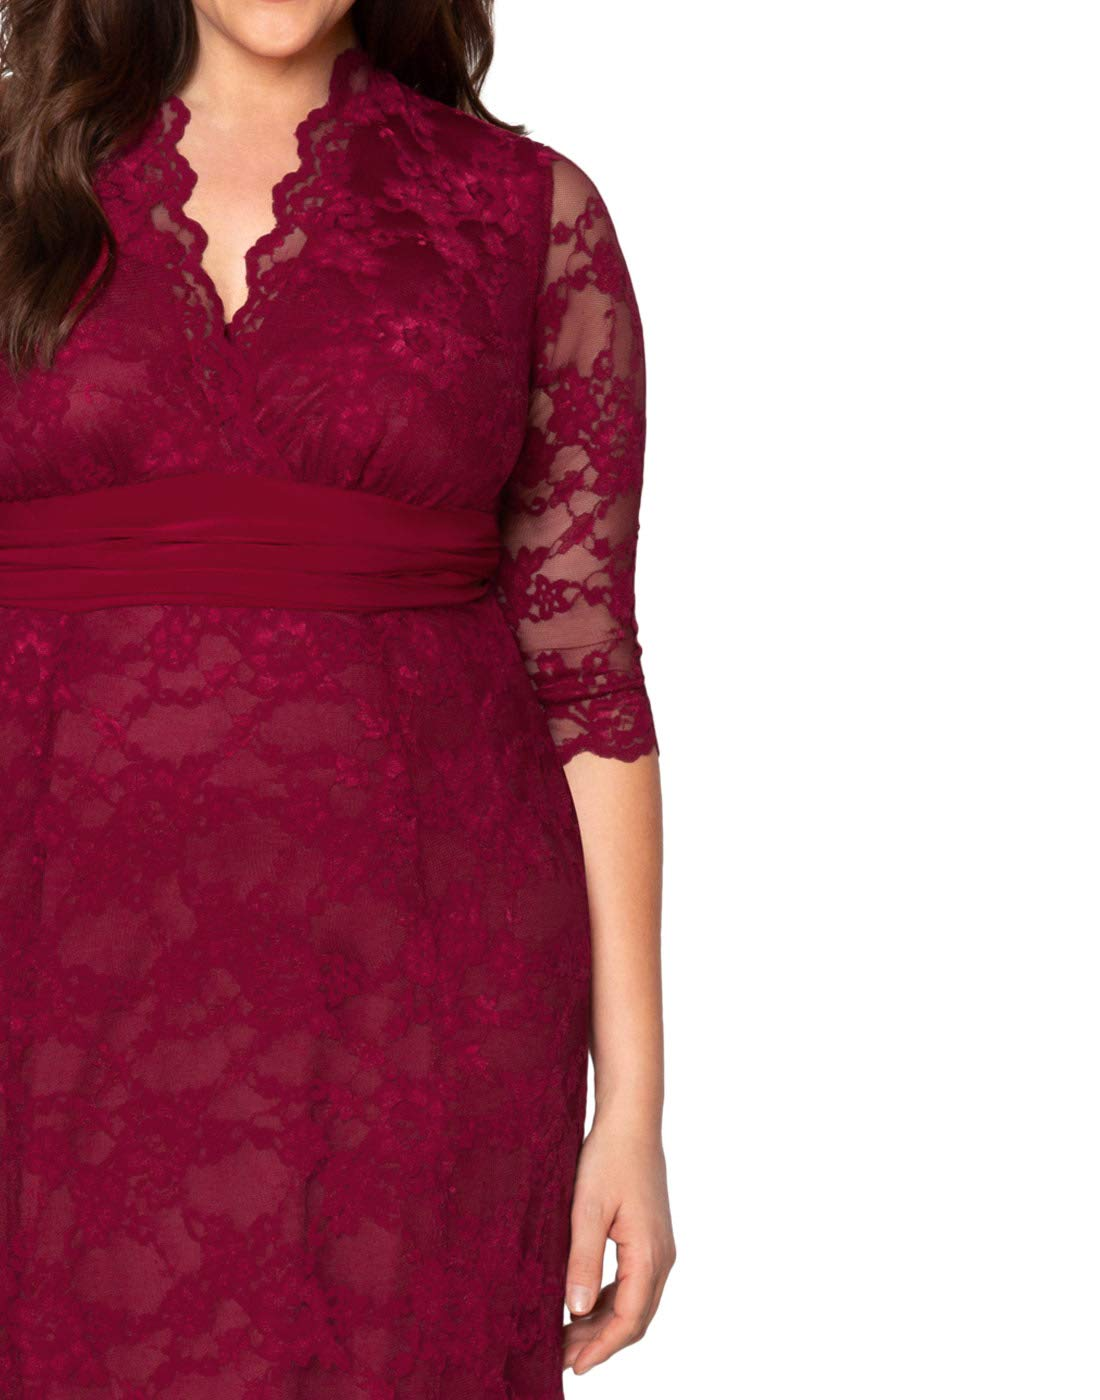 39df0eba8f0 ... Plus Kiyonna Women s Plus Size Screen Siren Lace Gown 5x Rose Wine.   